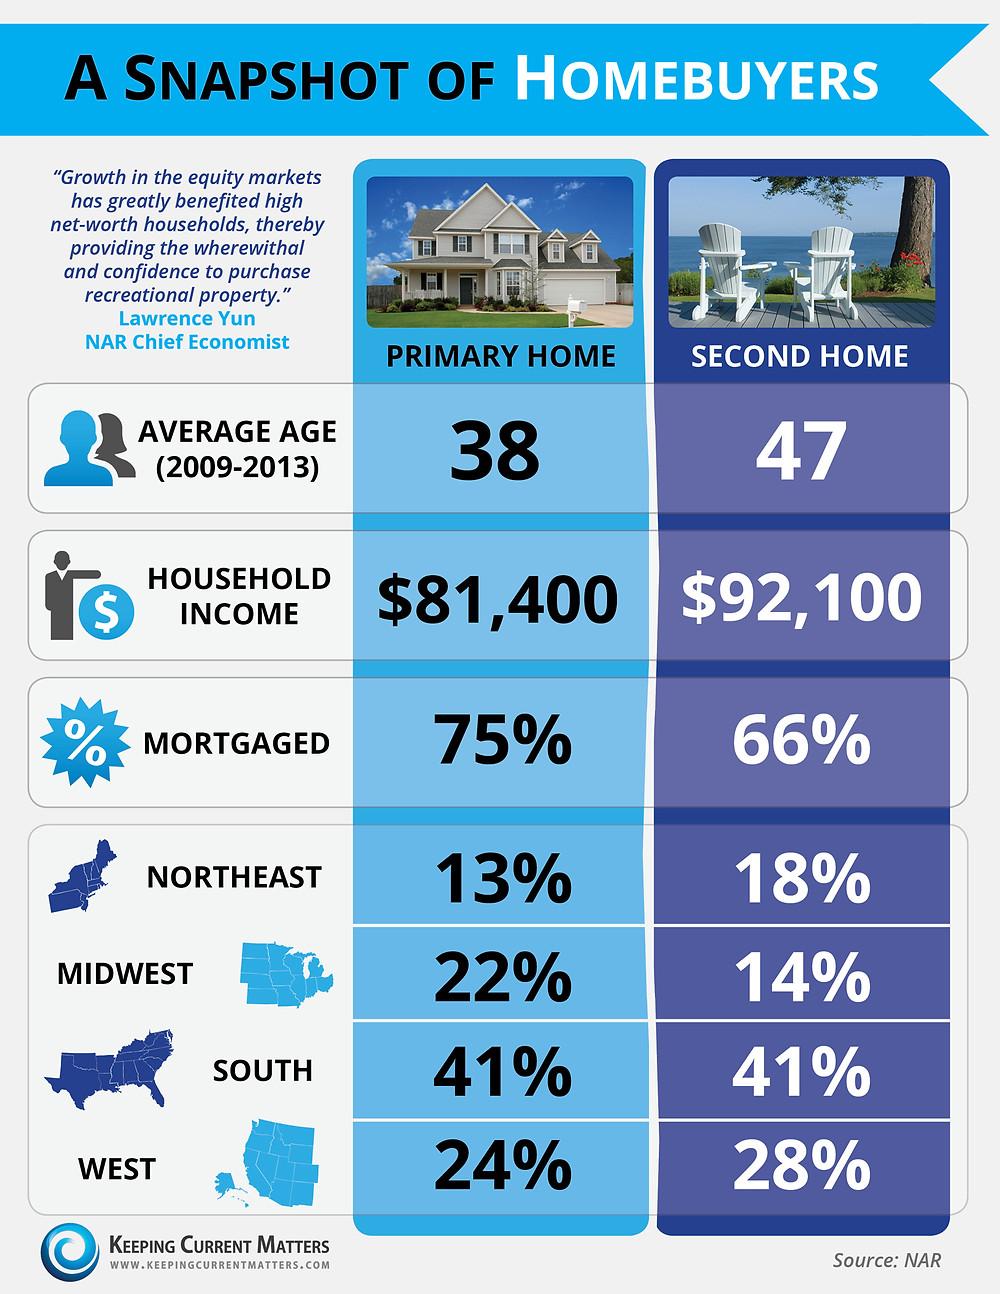 A Snapshot of Homebuyers